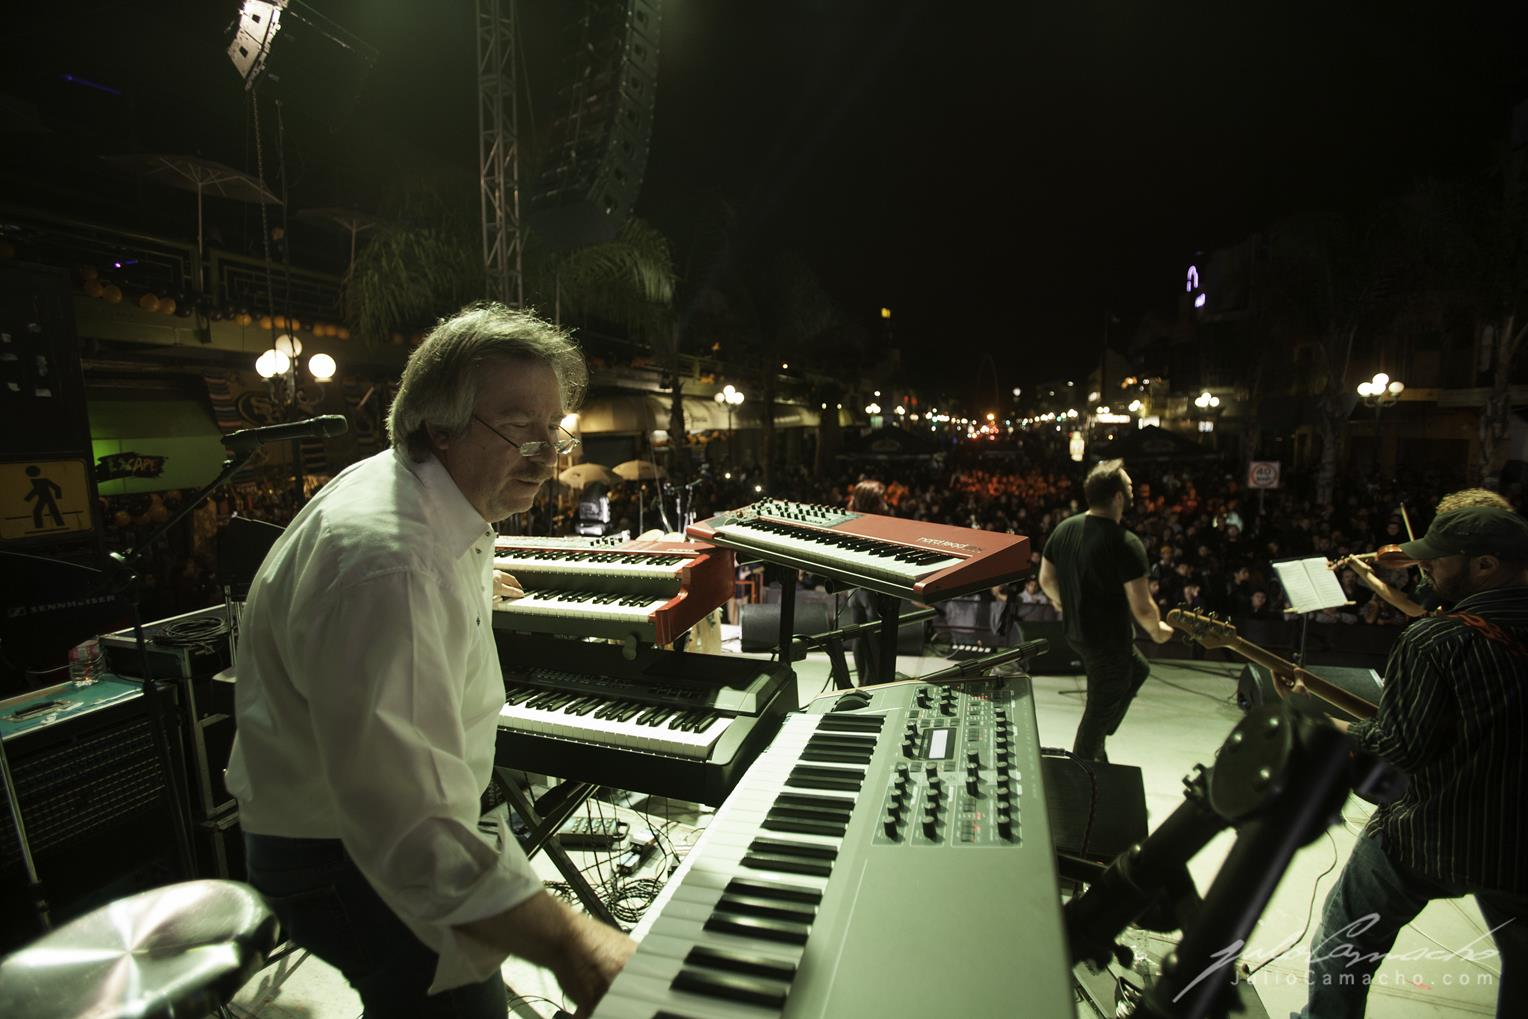 2014-10-30 31 CAST TOUR Ensenada y Tijuana - 1728 - www.Juli (Copy).jpg